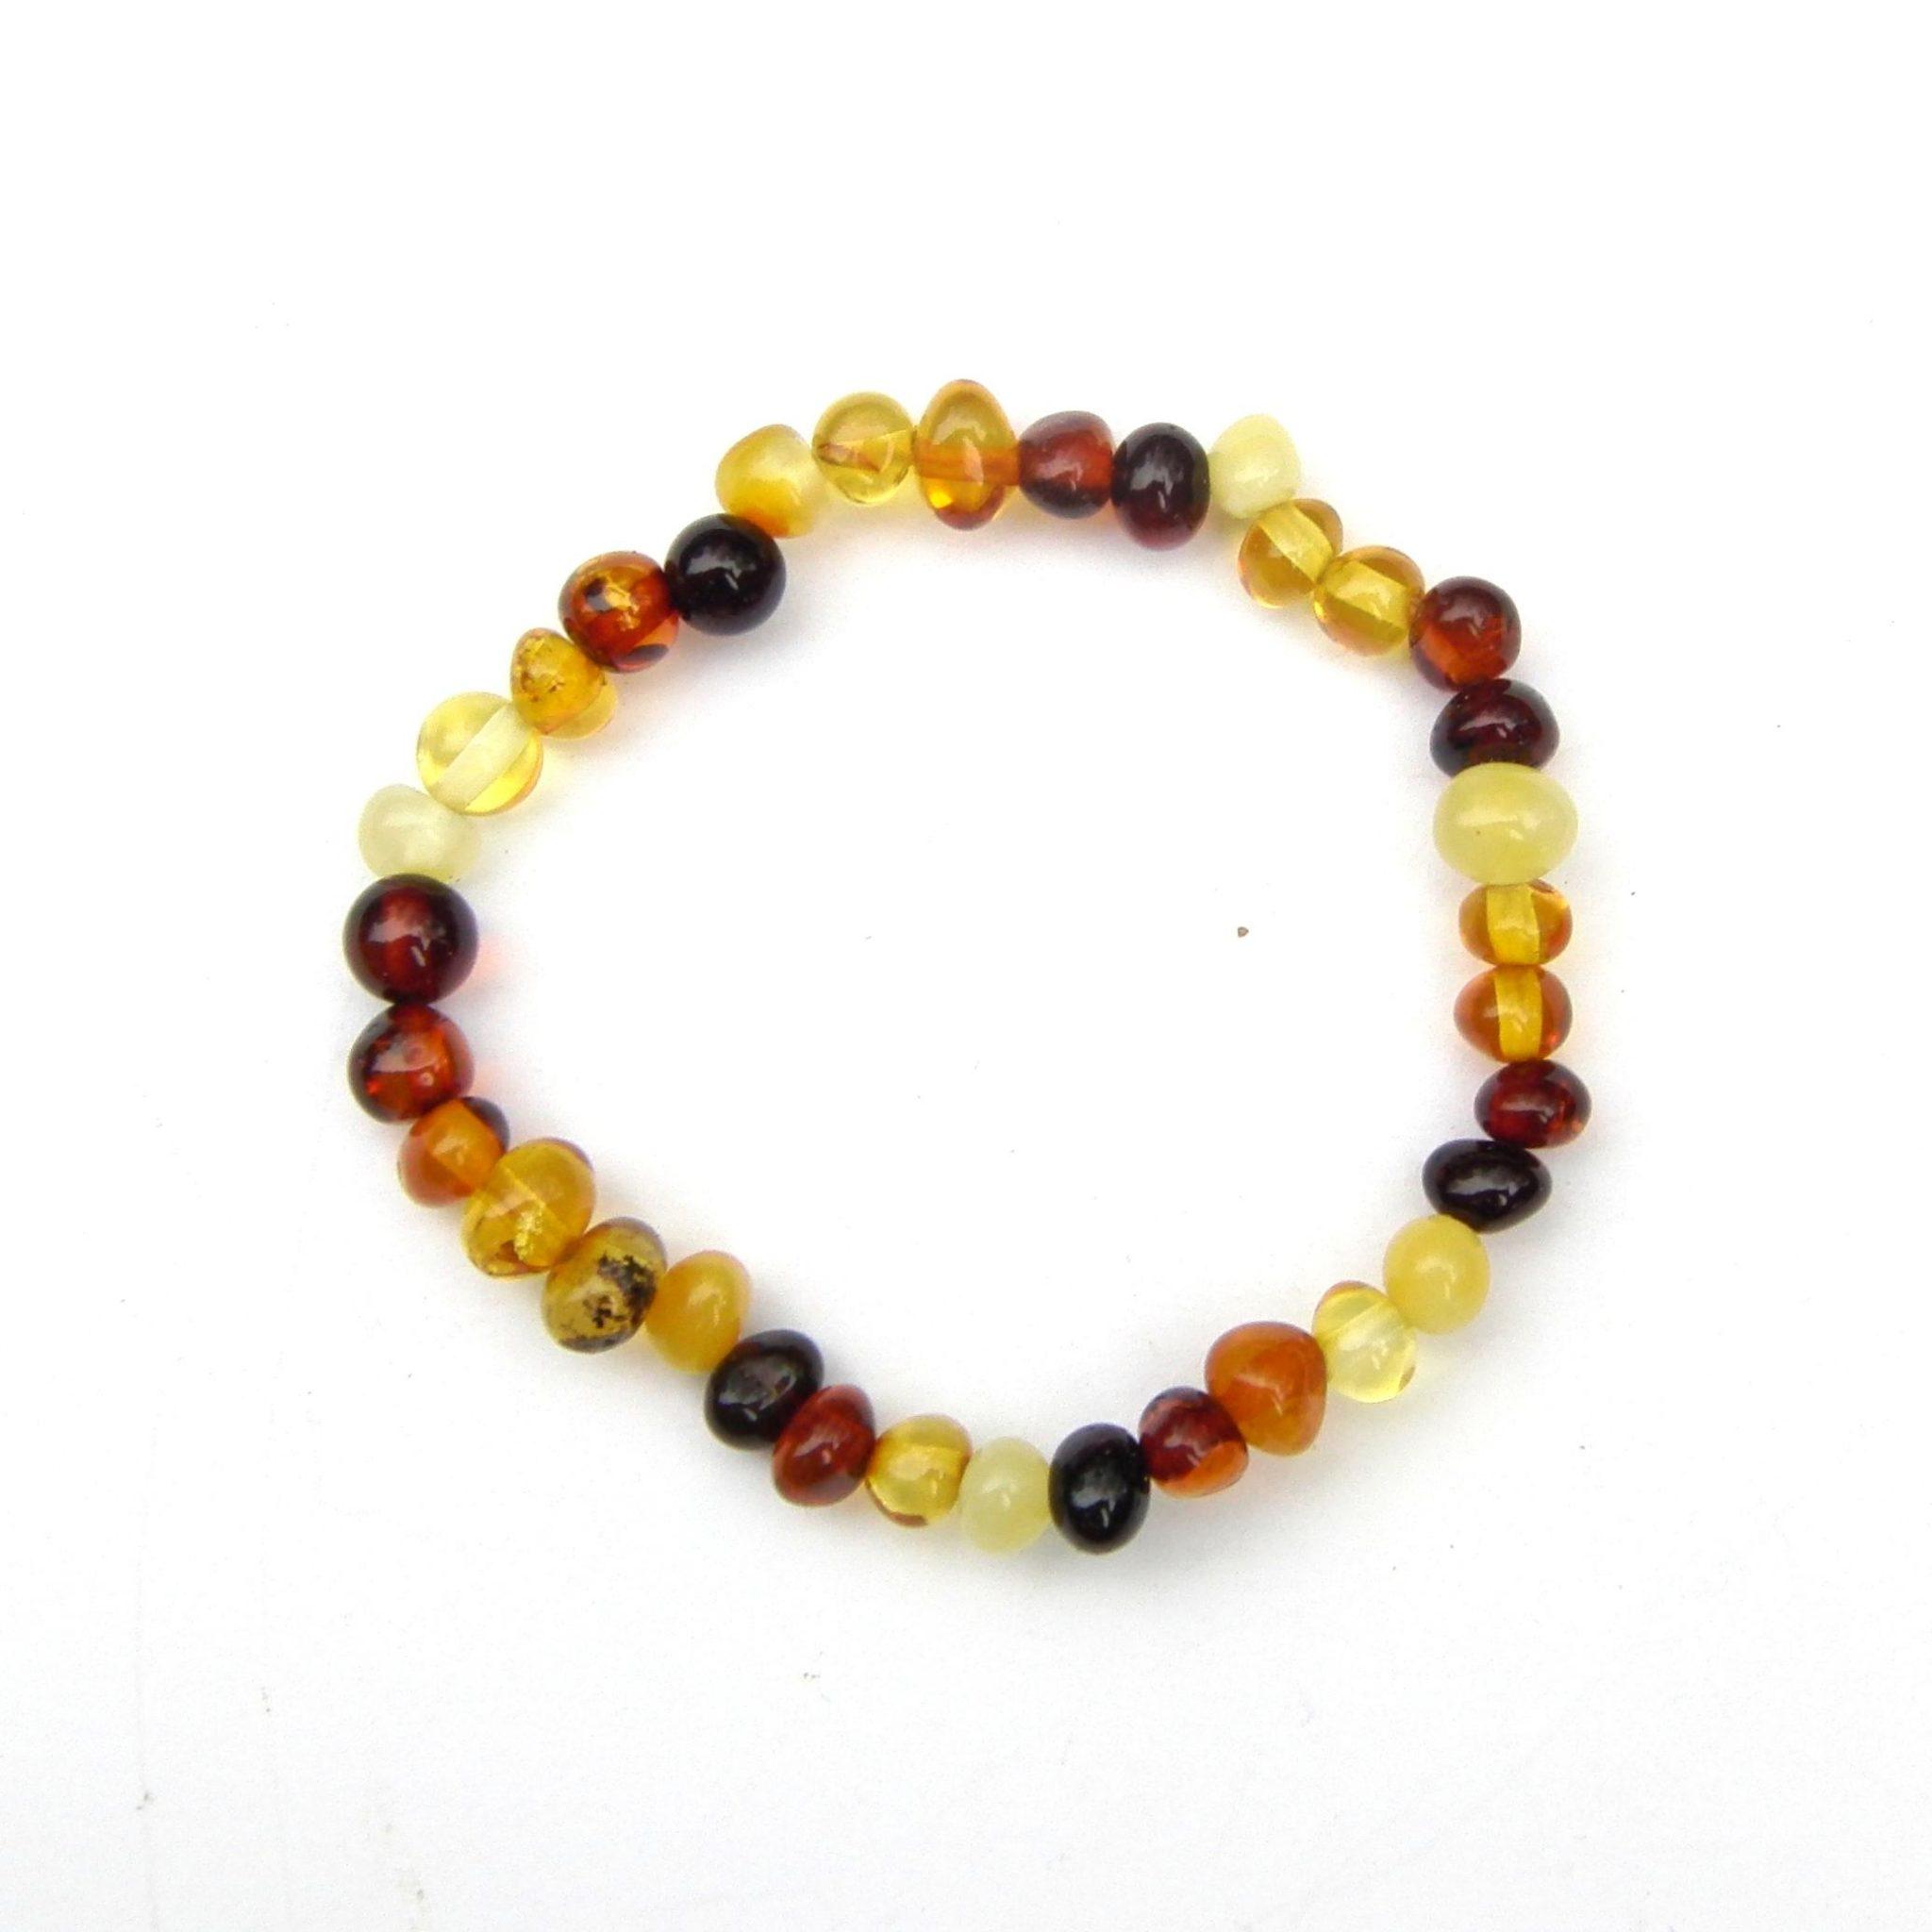 Beautiful Mixed Amber Child's Beaded Bracelet